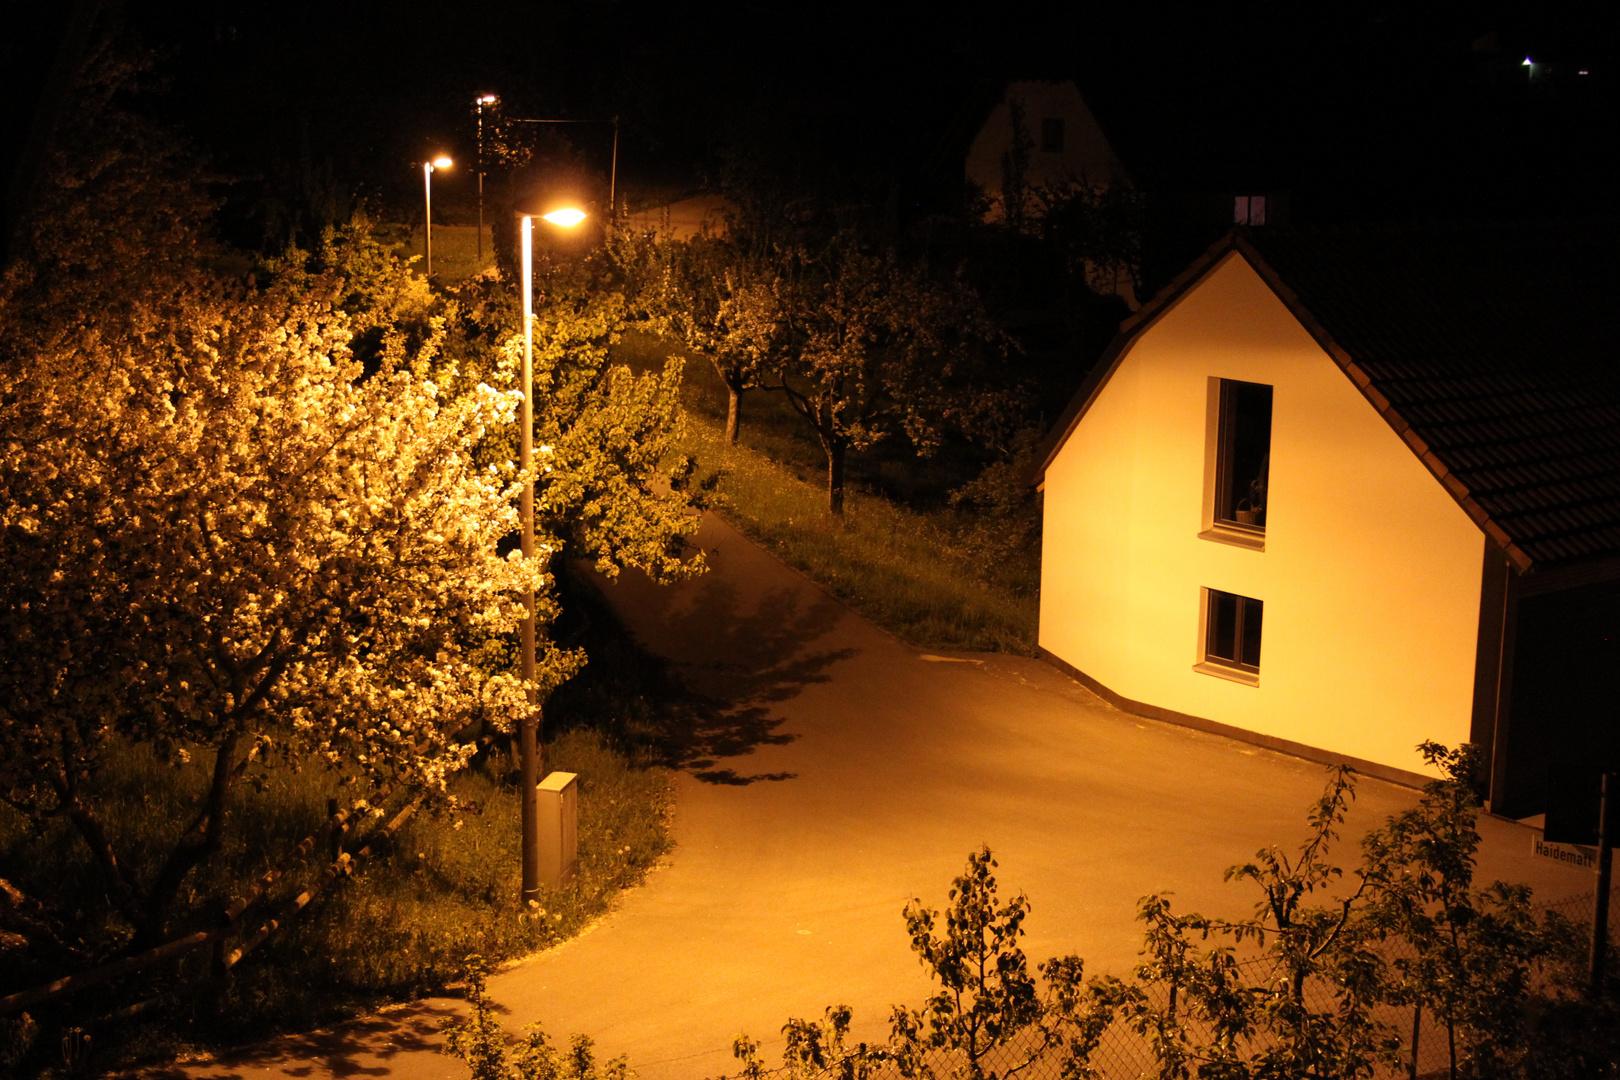 Straßenkreuzung bei Nacht